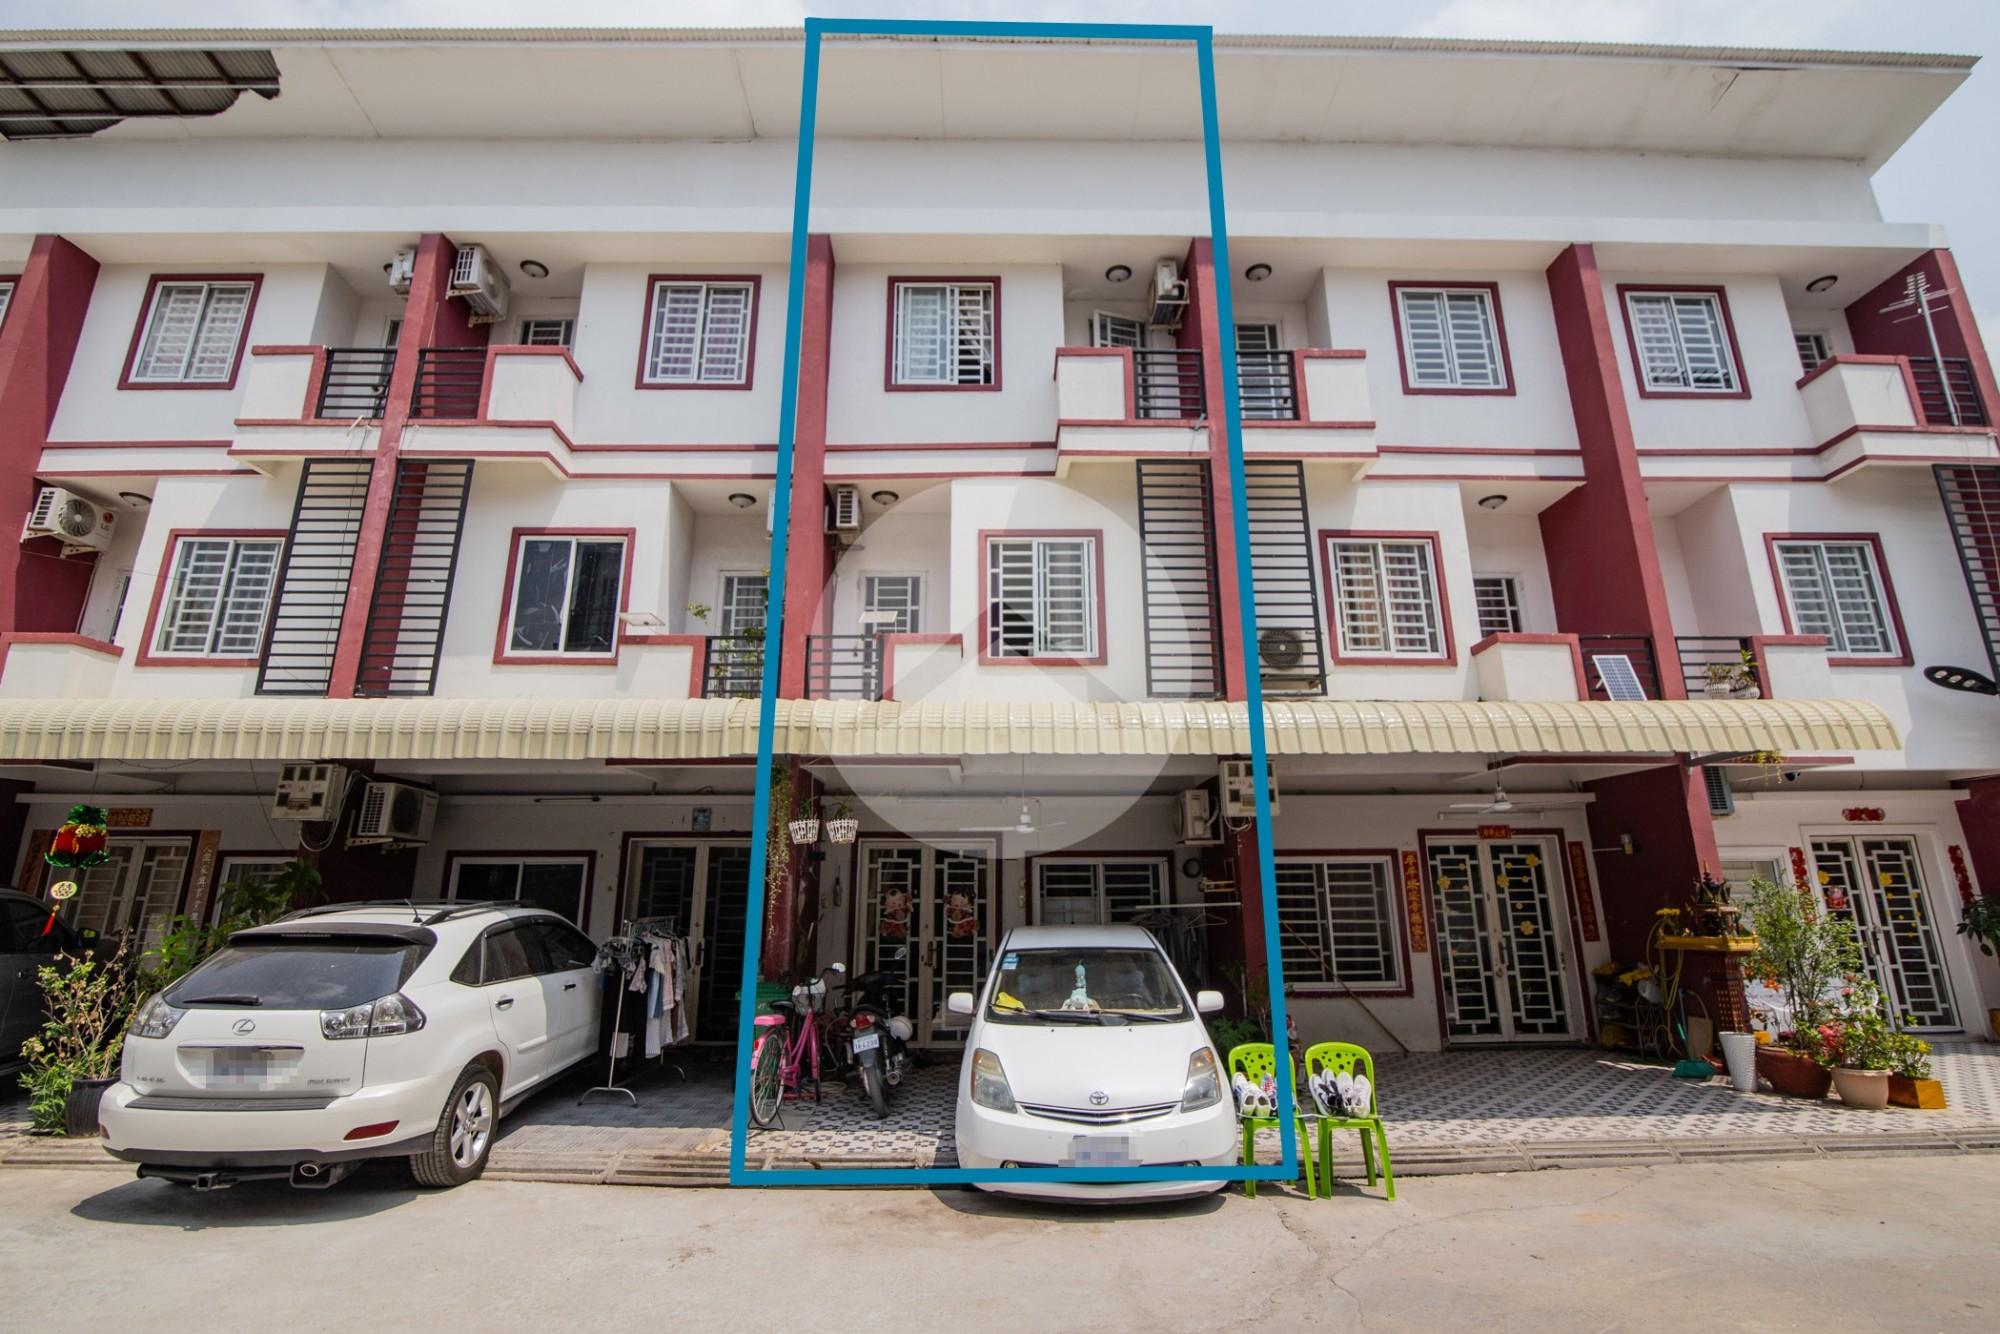 3 Bedroom Townhouse For Sale - Nirot, Phnom Penh